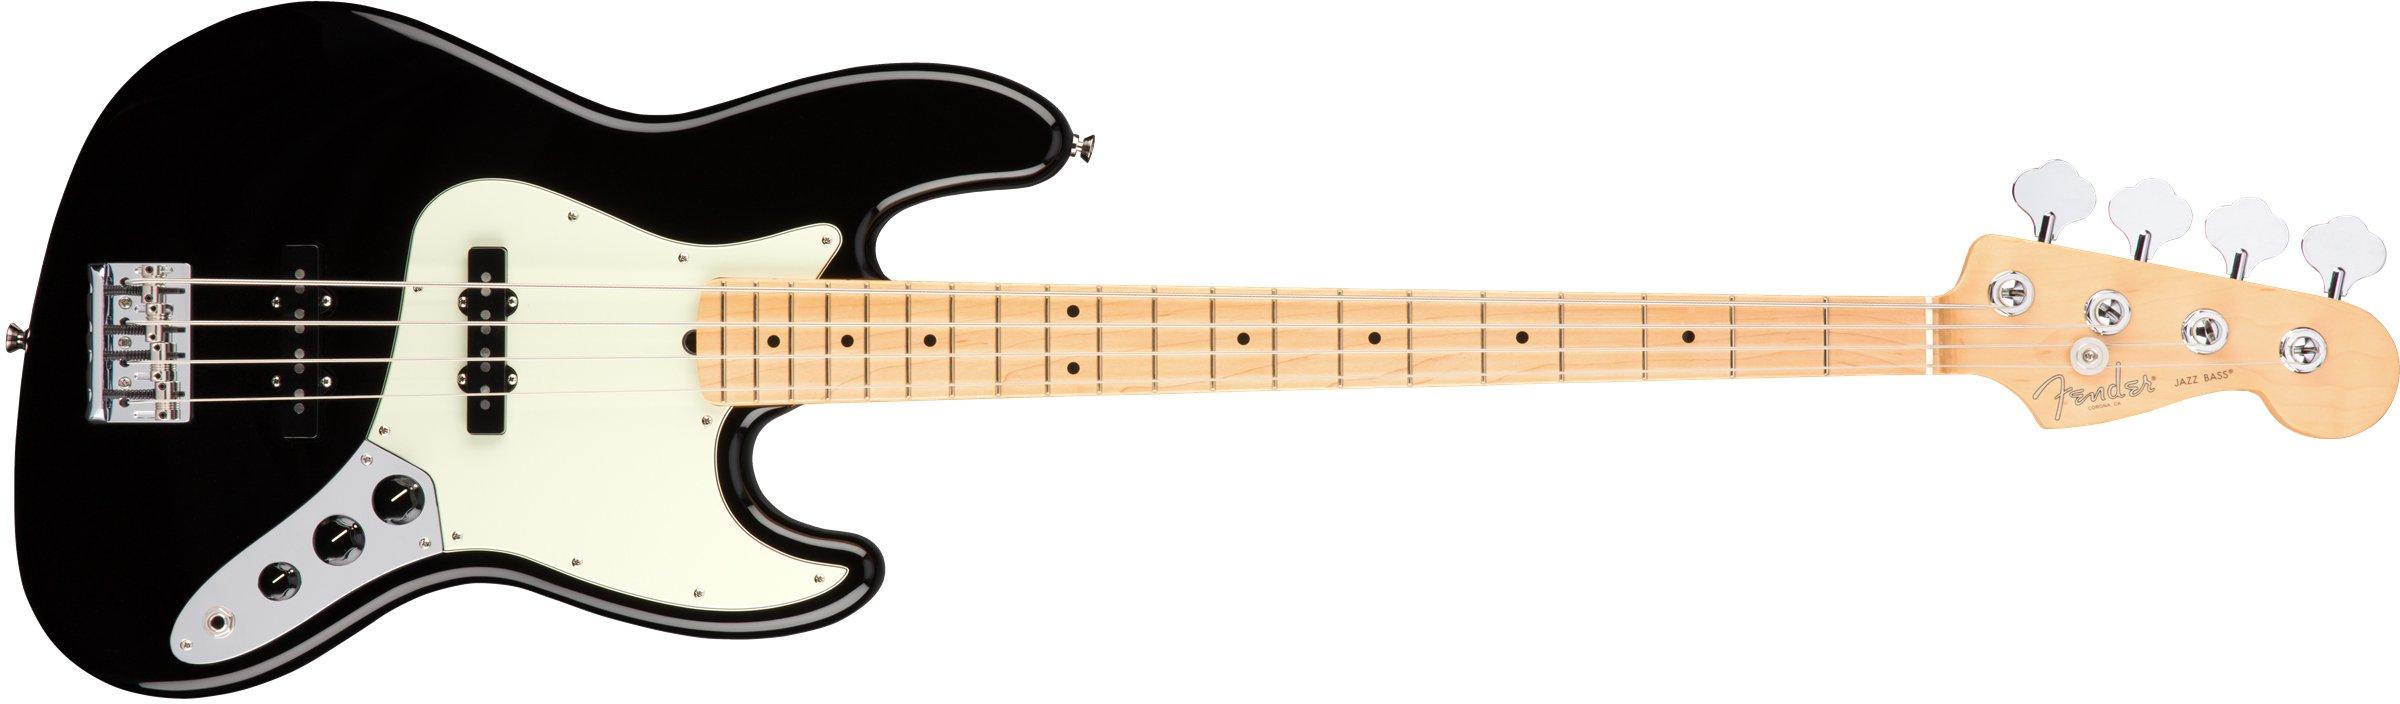 Fender American Pro Jazz Bass MN BK � Basso elettrico